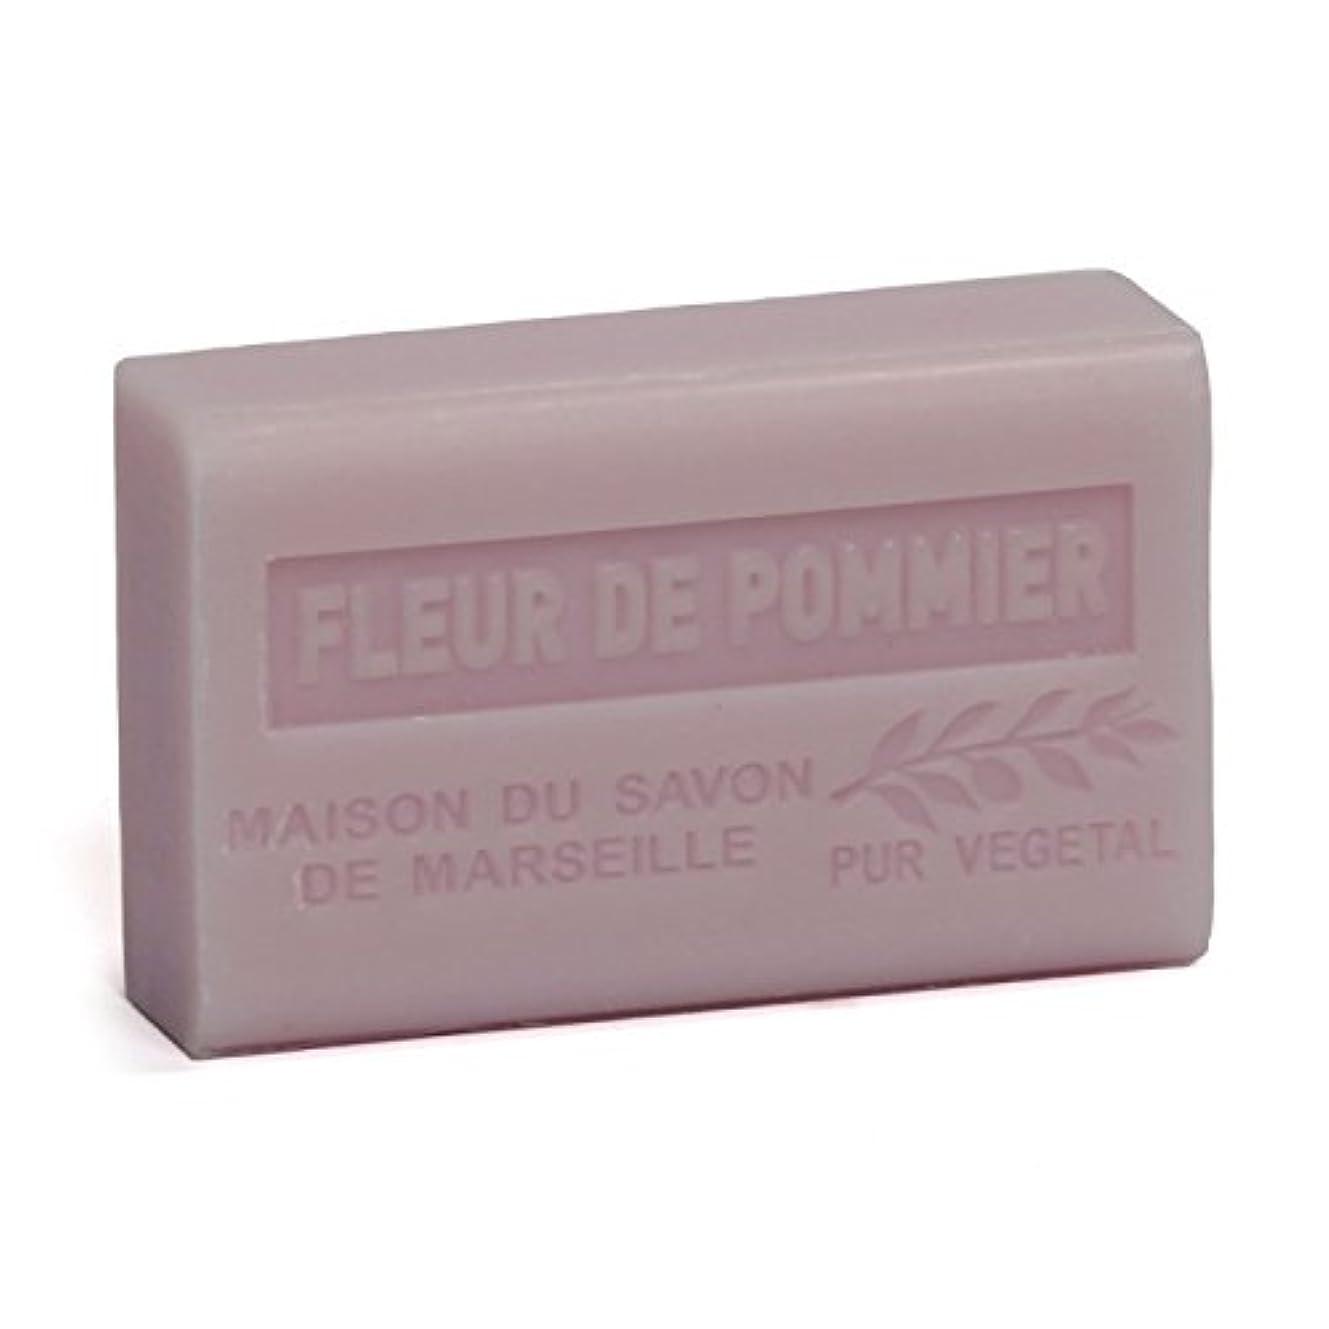 Savon de Marseille Soap Apple Blossom Shea Butter 125g